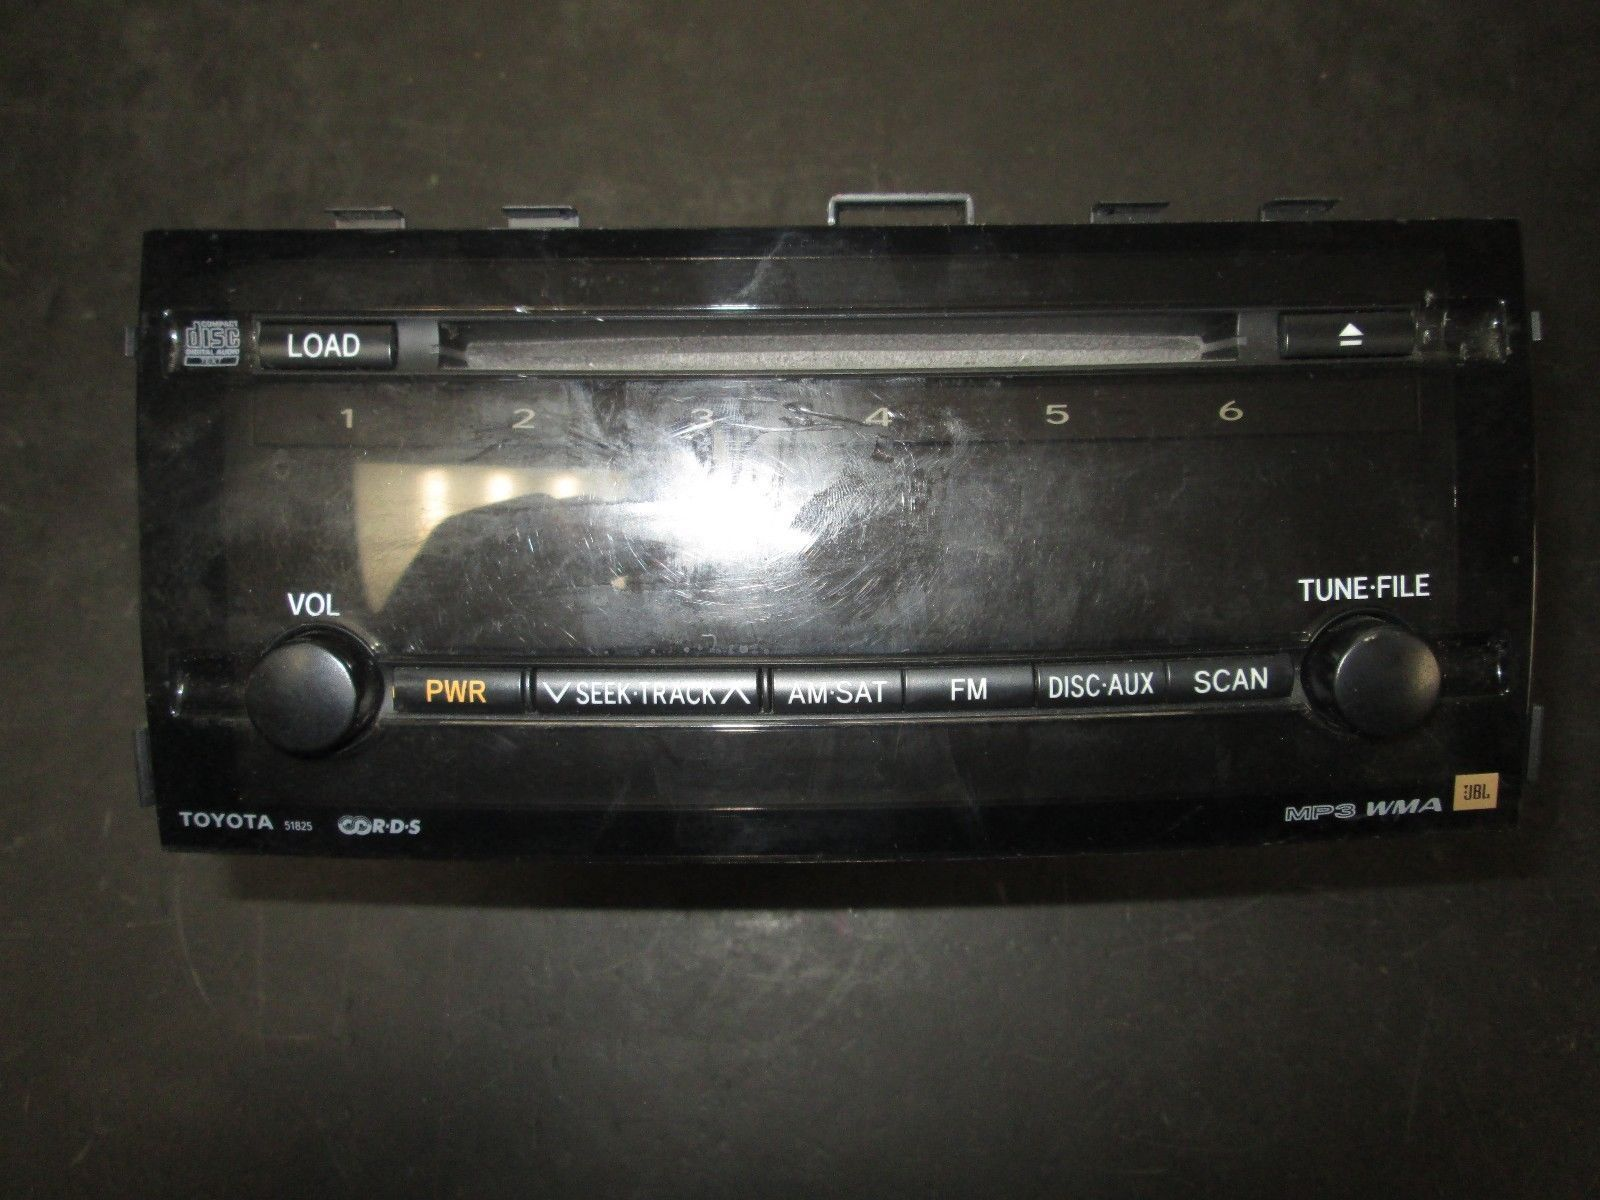 Toyota Amplifier: 40 listings